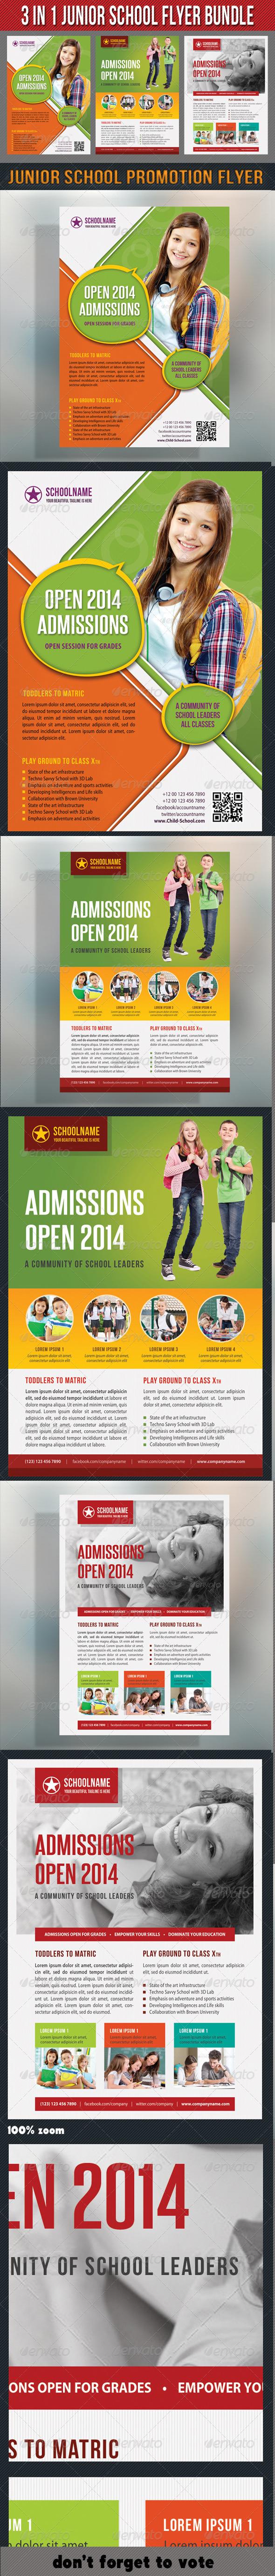 3 in 1 Junior School Promotion Flyer Bundle 02 - Events Flyers